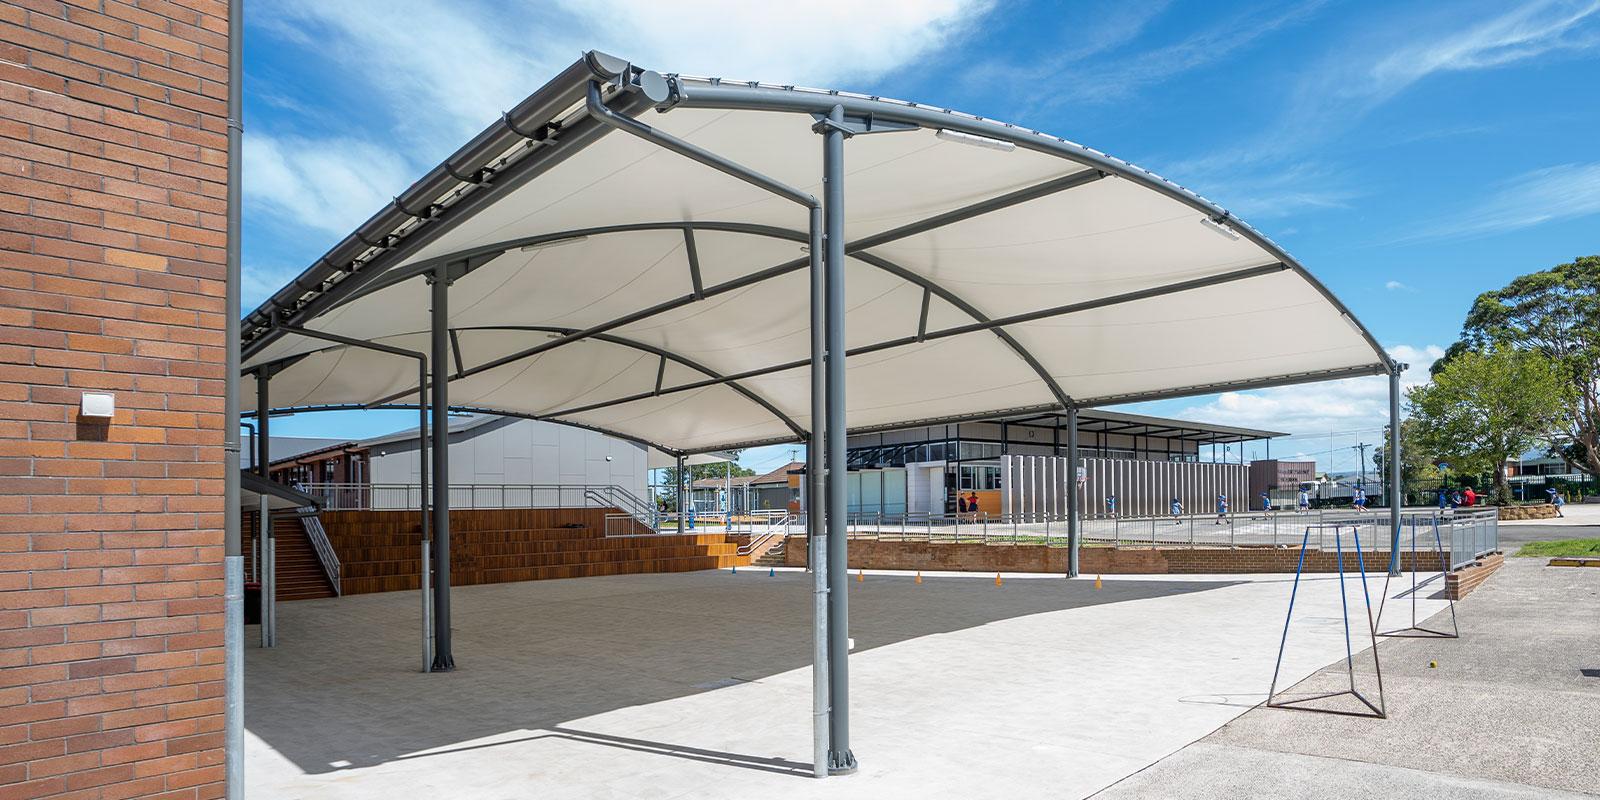 School COLA at a primary school in Dapto, NSW